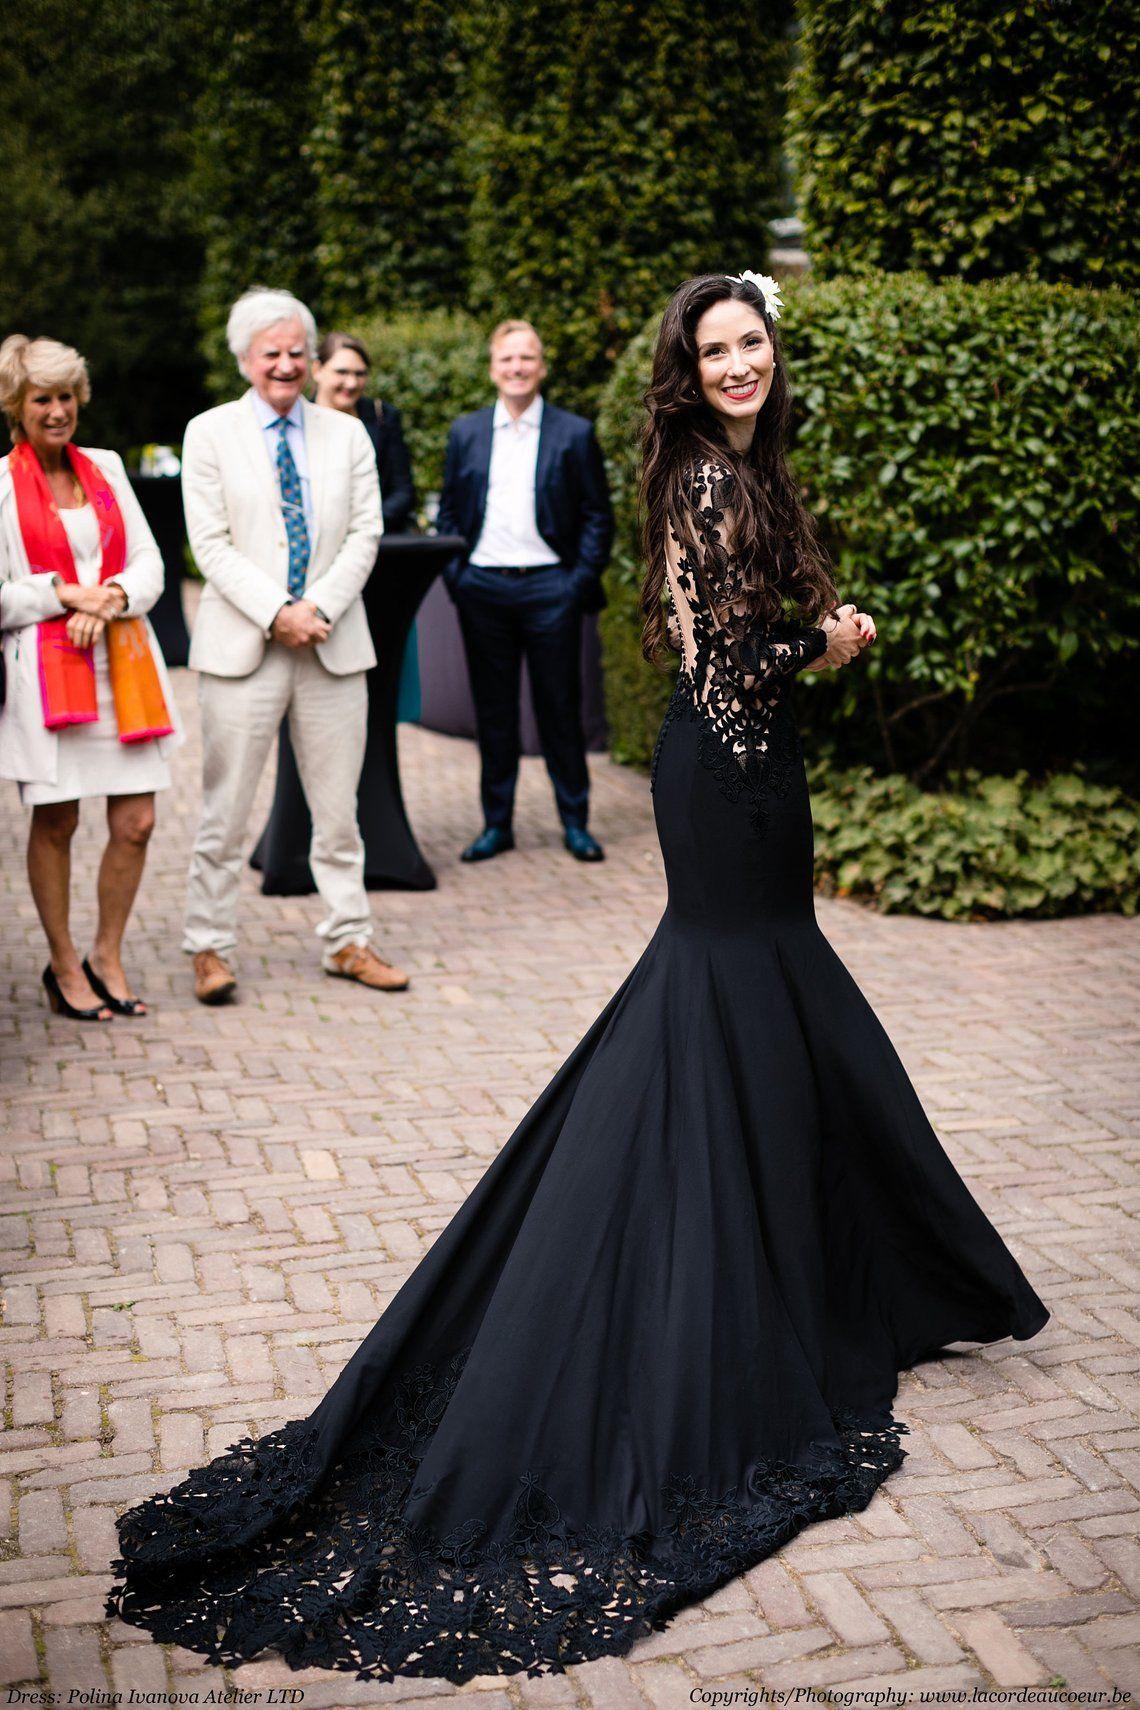 Black Wedding Dress Black Lace Wedding Dress Black Lace Gown Gothic Wedding Dress Alternative Dress Twilight Wedding Dress Black Lace Wedding Dress Black Lace Wedding Wedding Dresses Lace